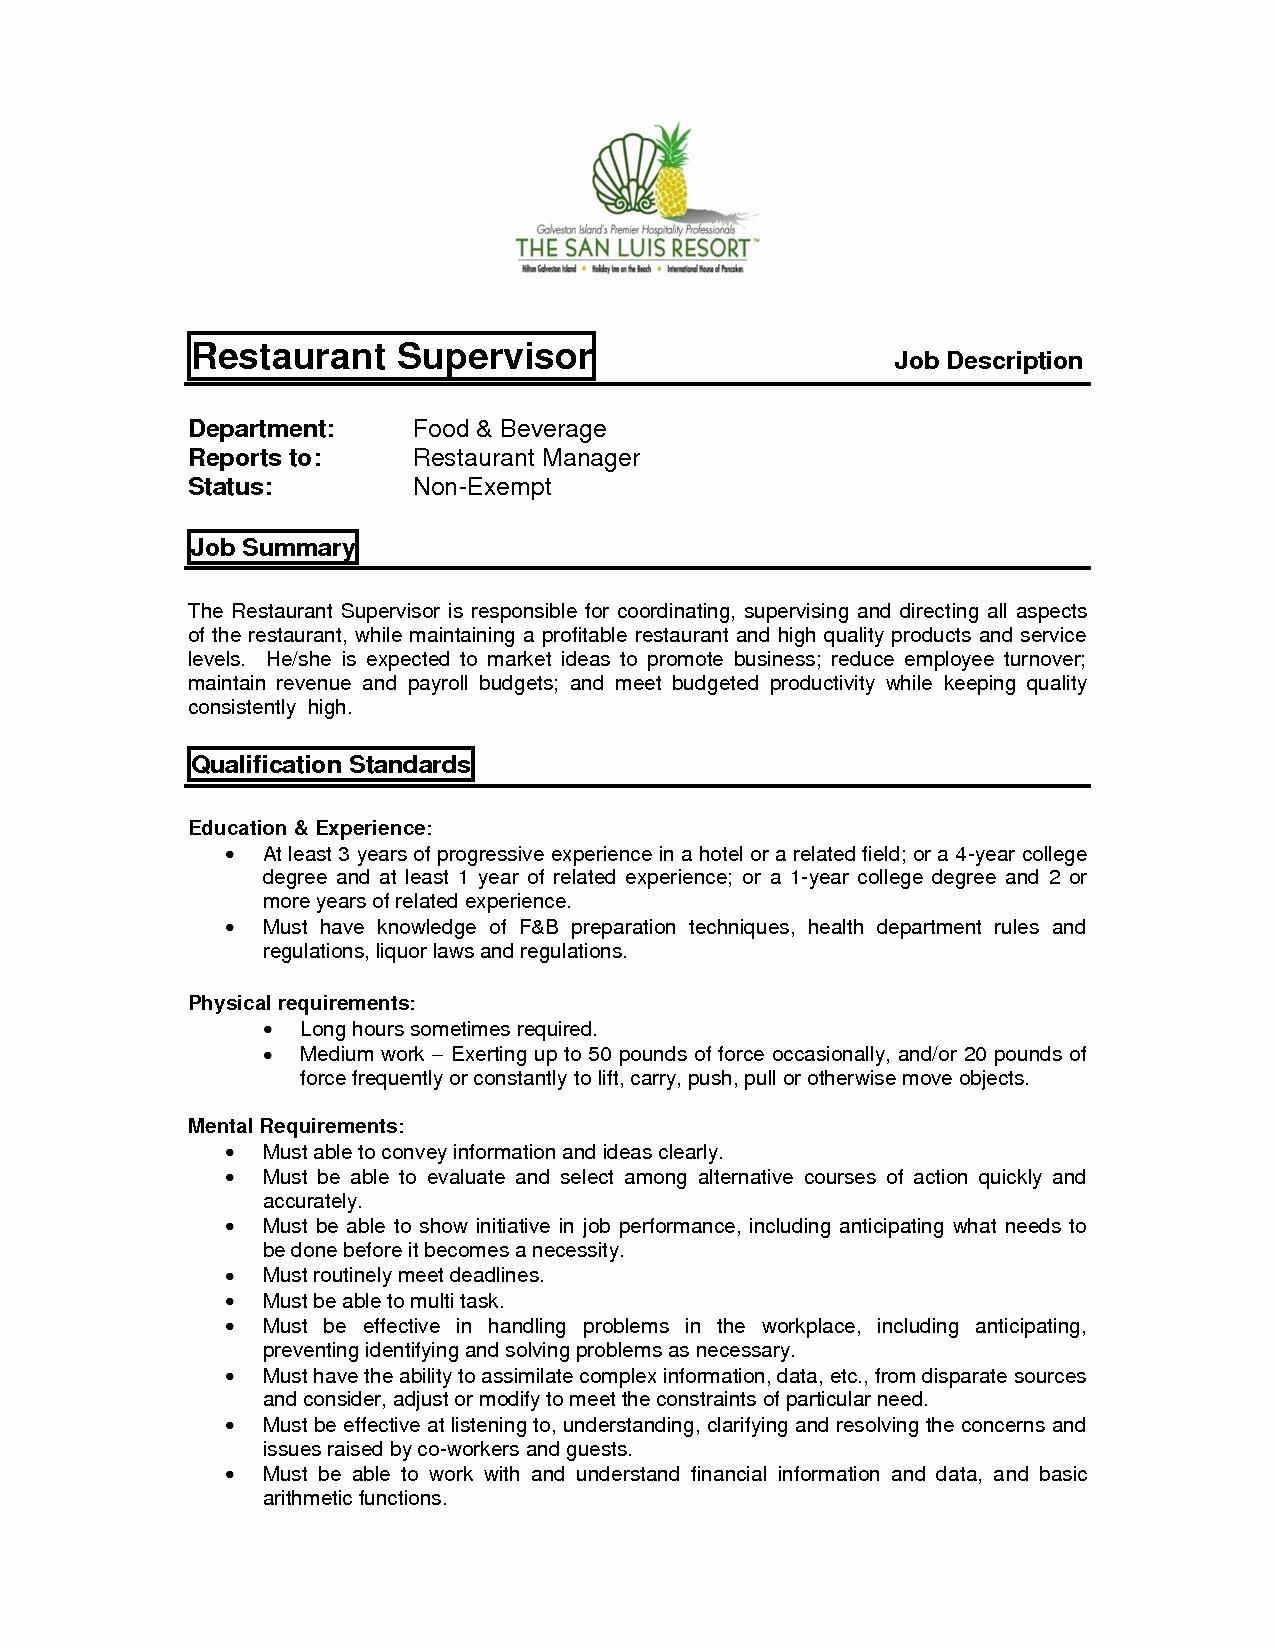 Restaurant Manager Job Description Resume Resume Ideas